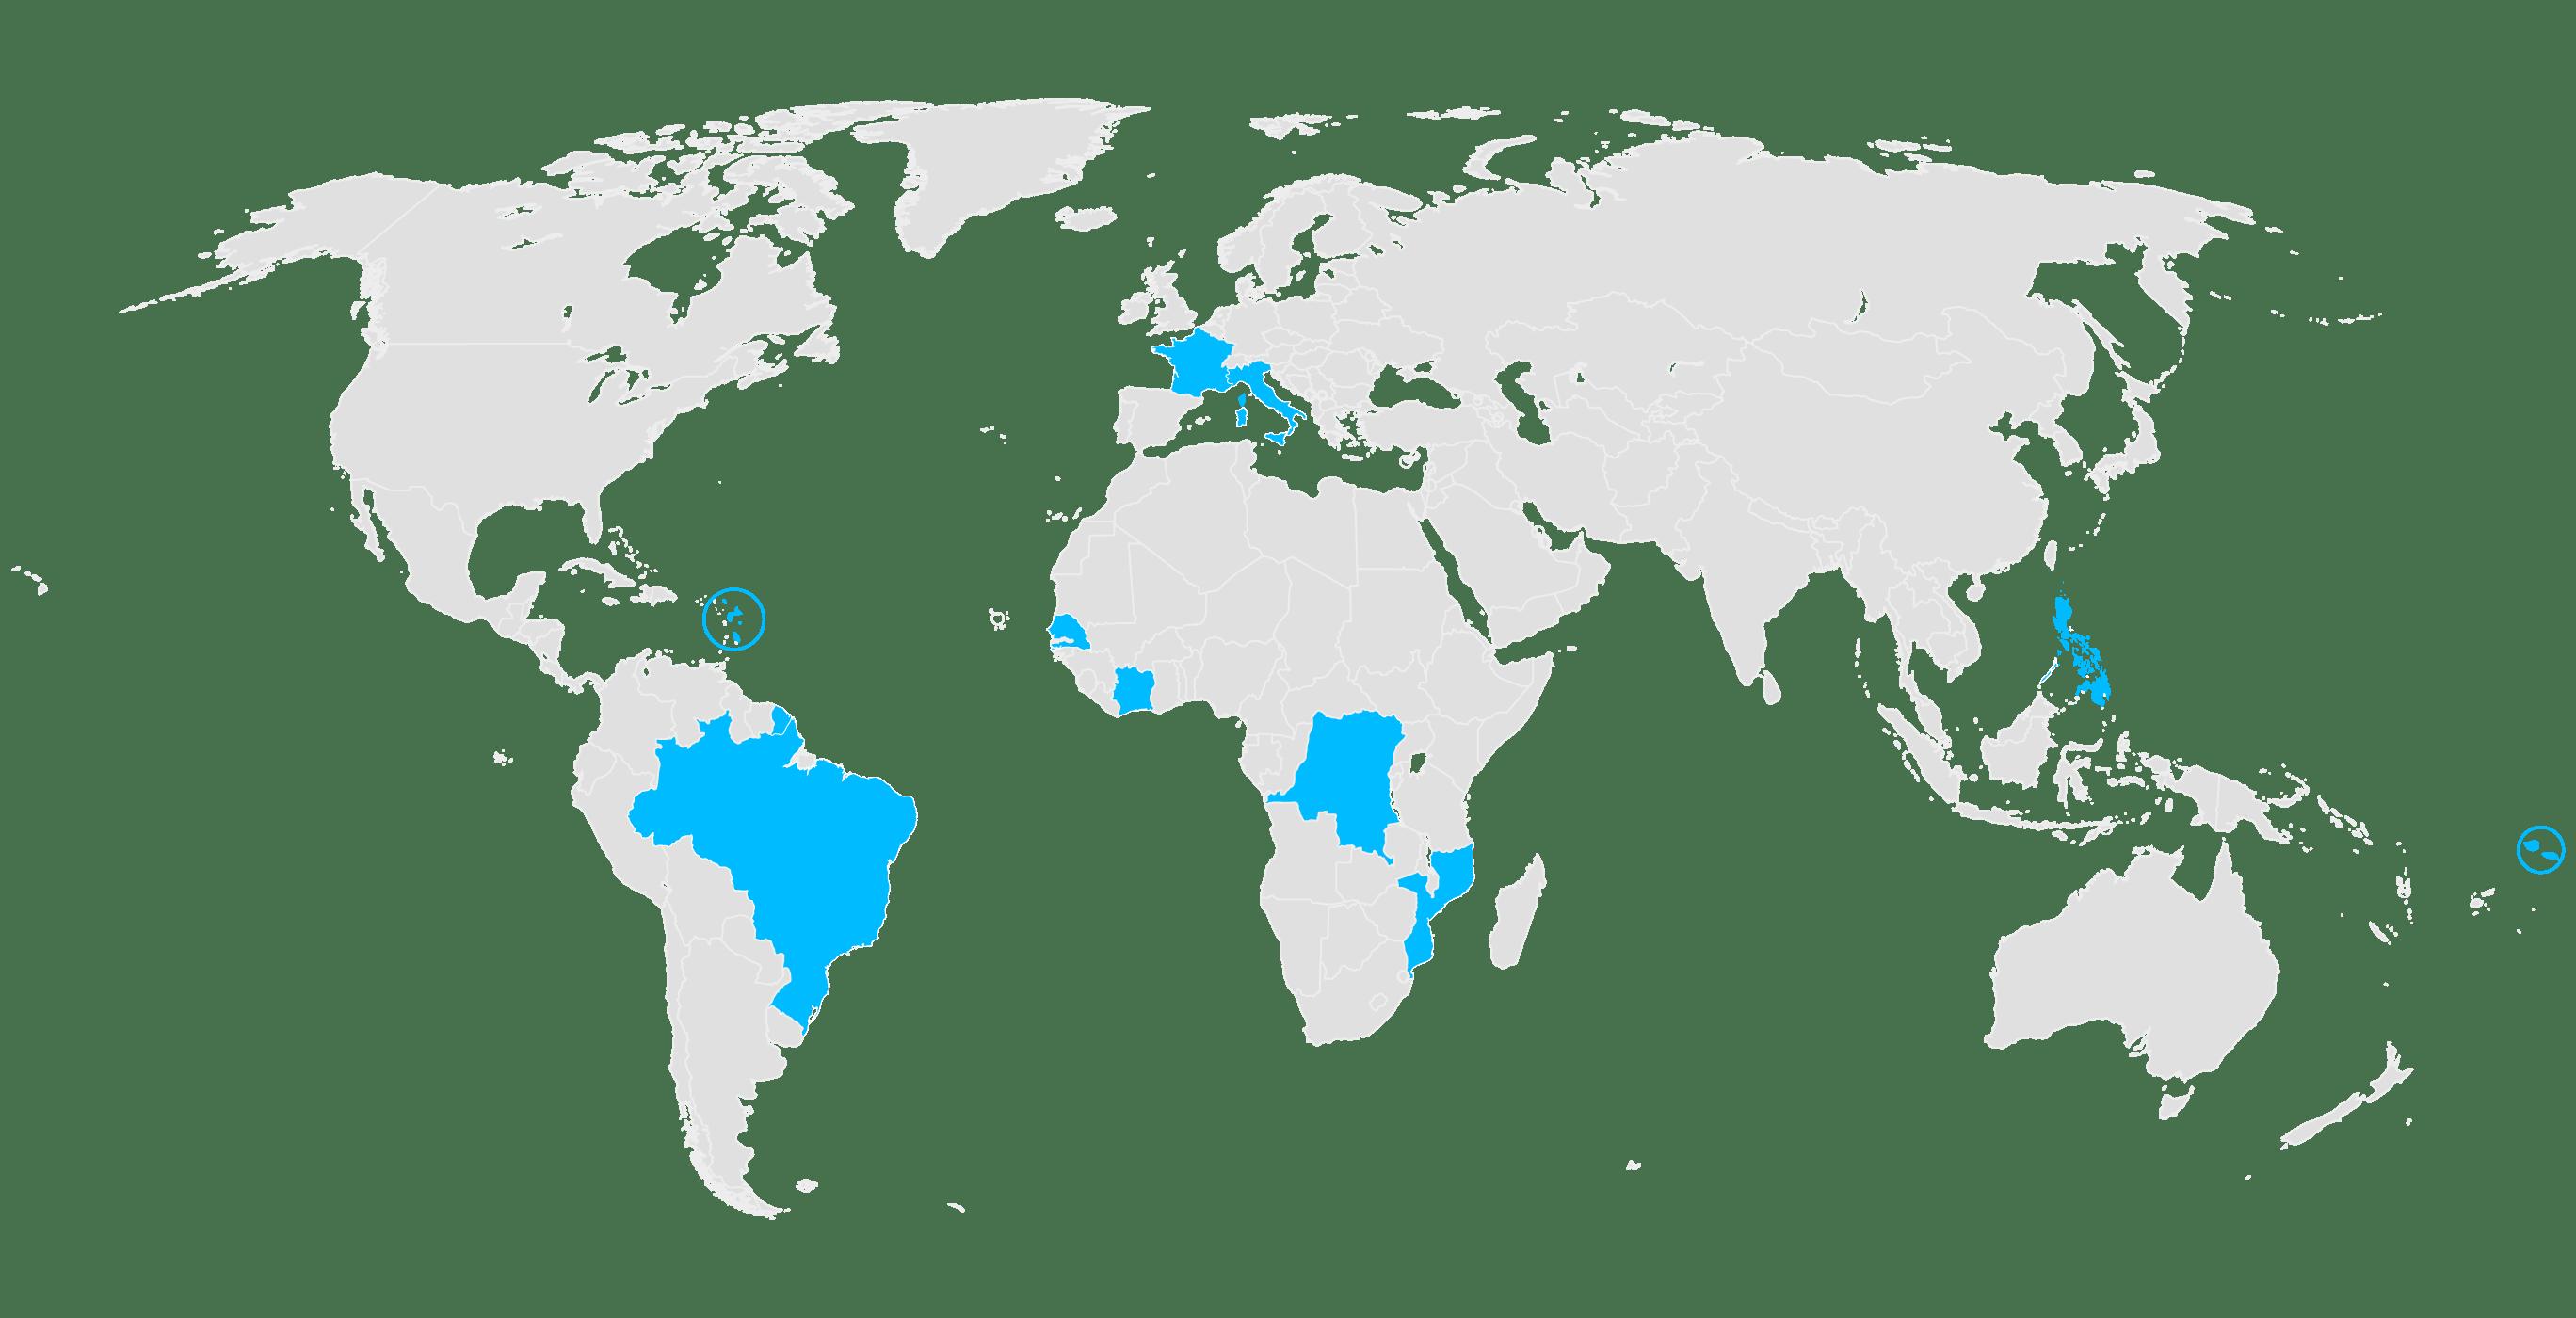 World map VAR